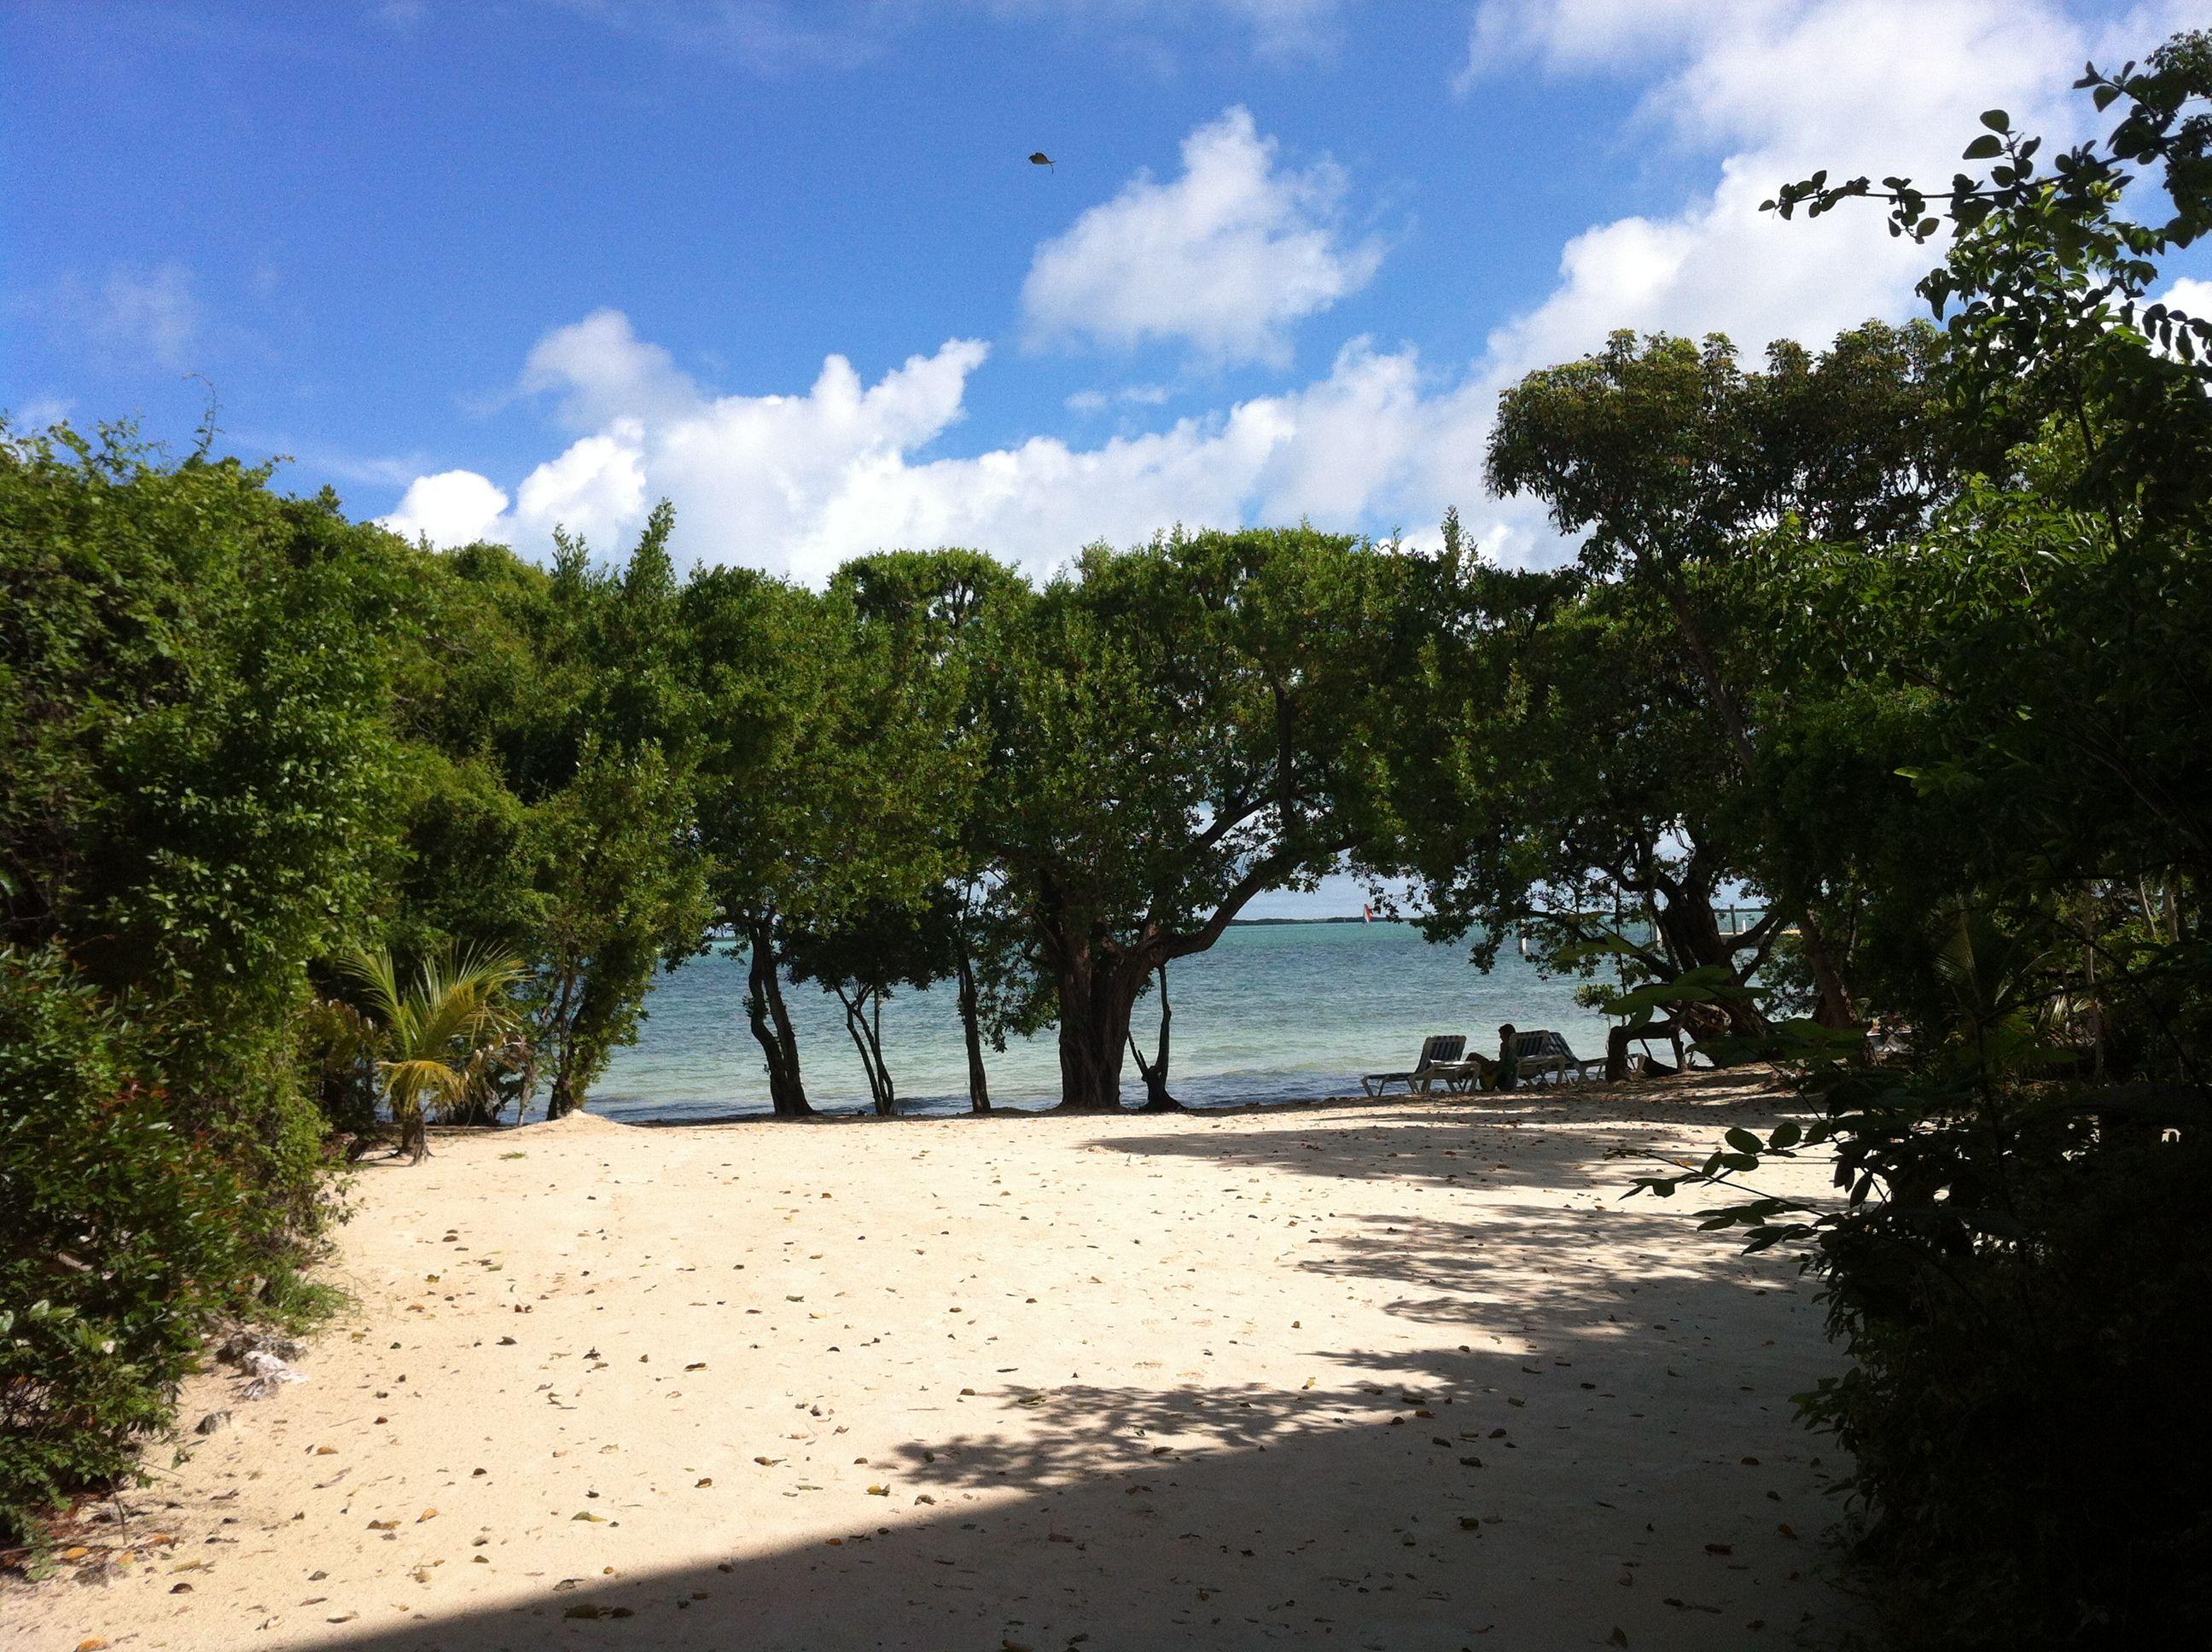 Hilton key largo resort picture of hilton key largo resort key - Hilton Key Largo Resort Brett Galloway